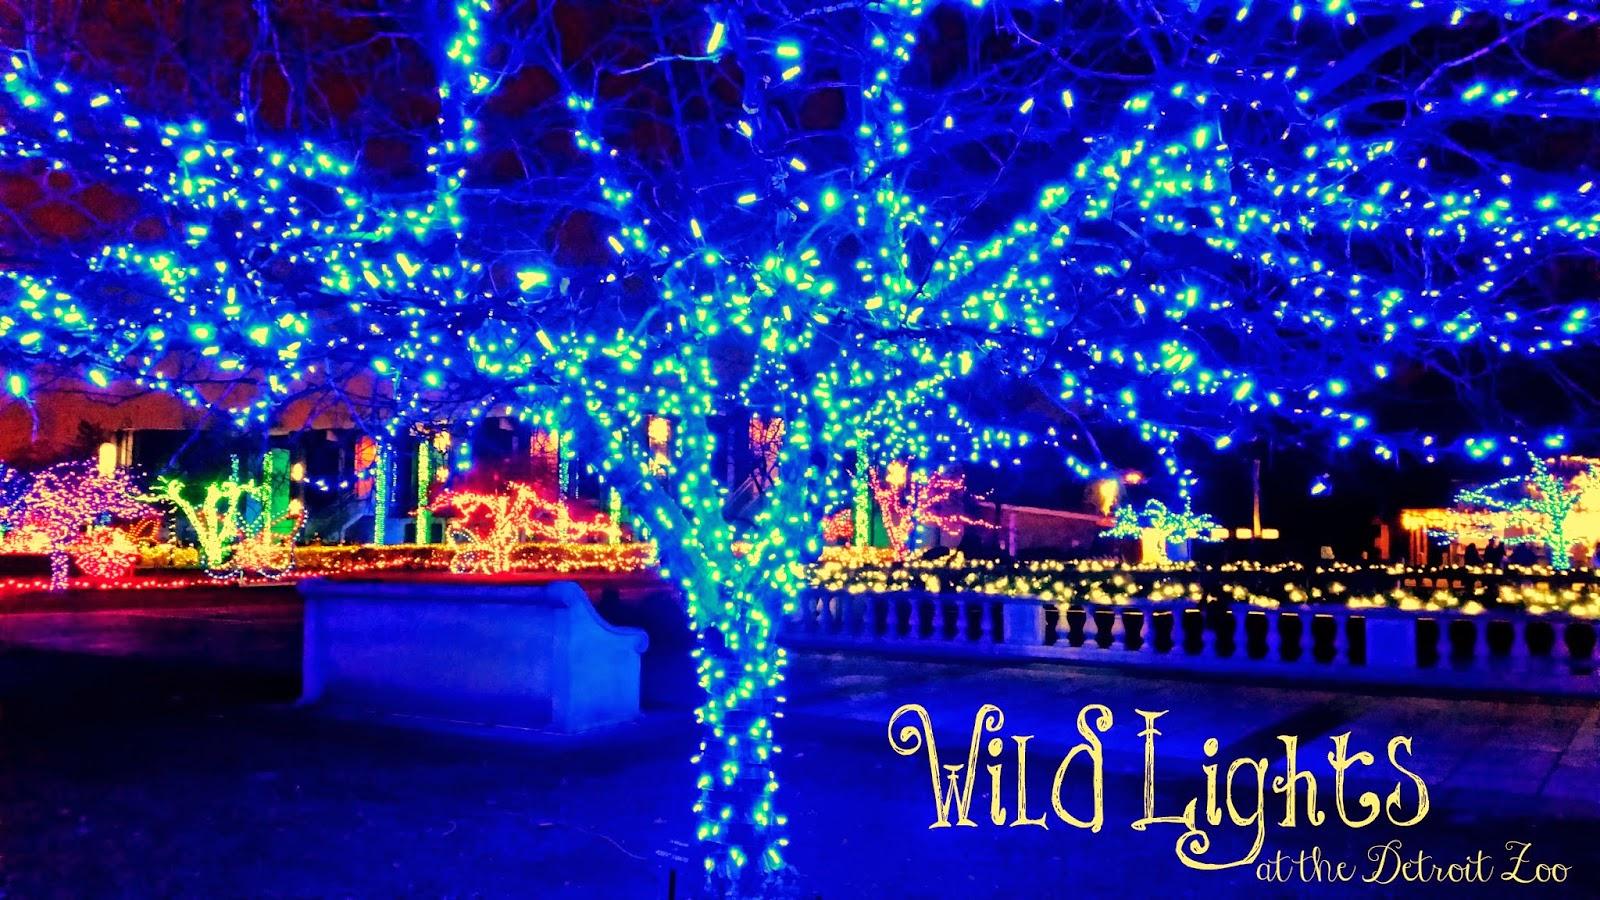 #ad #WildLights Detroit Zoo